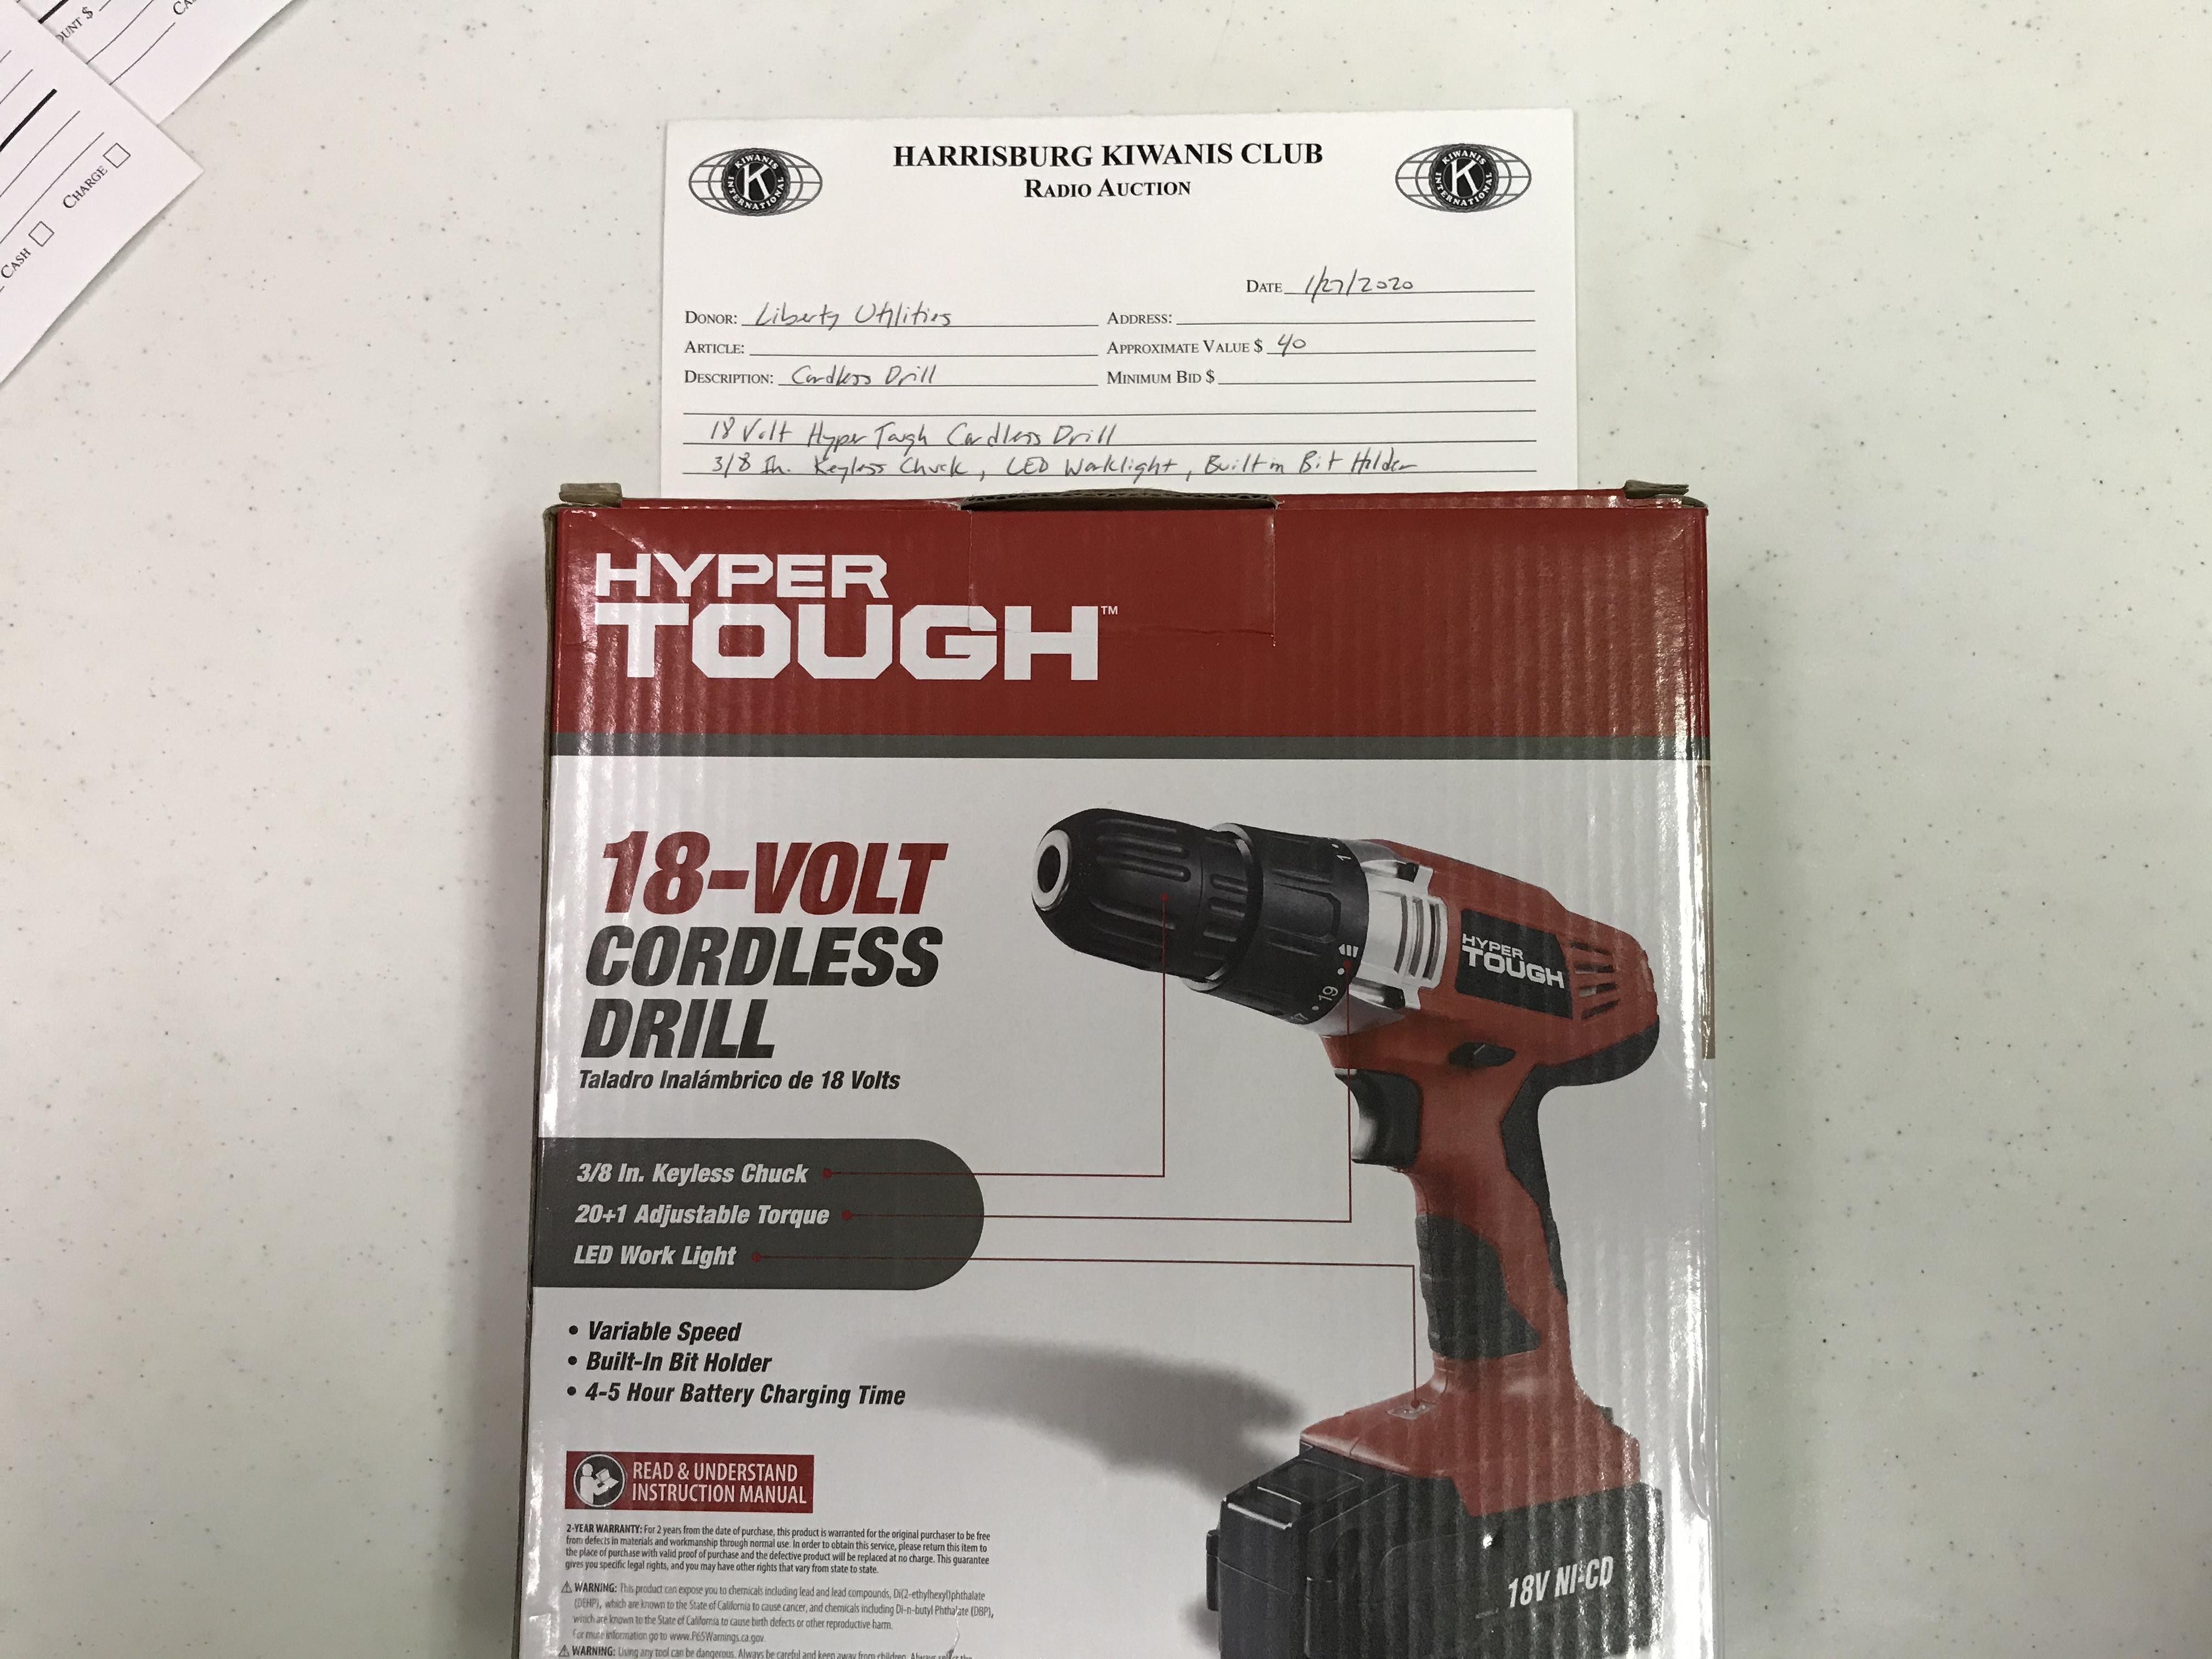 Item 221 - Liberty Utilities Hyper Tough 18 Volt Cordless Drill